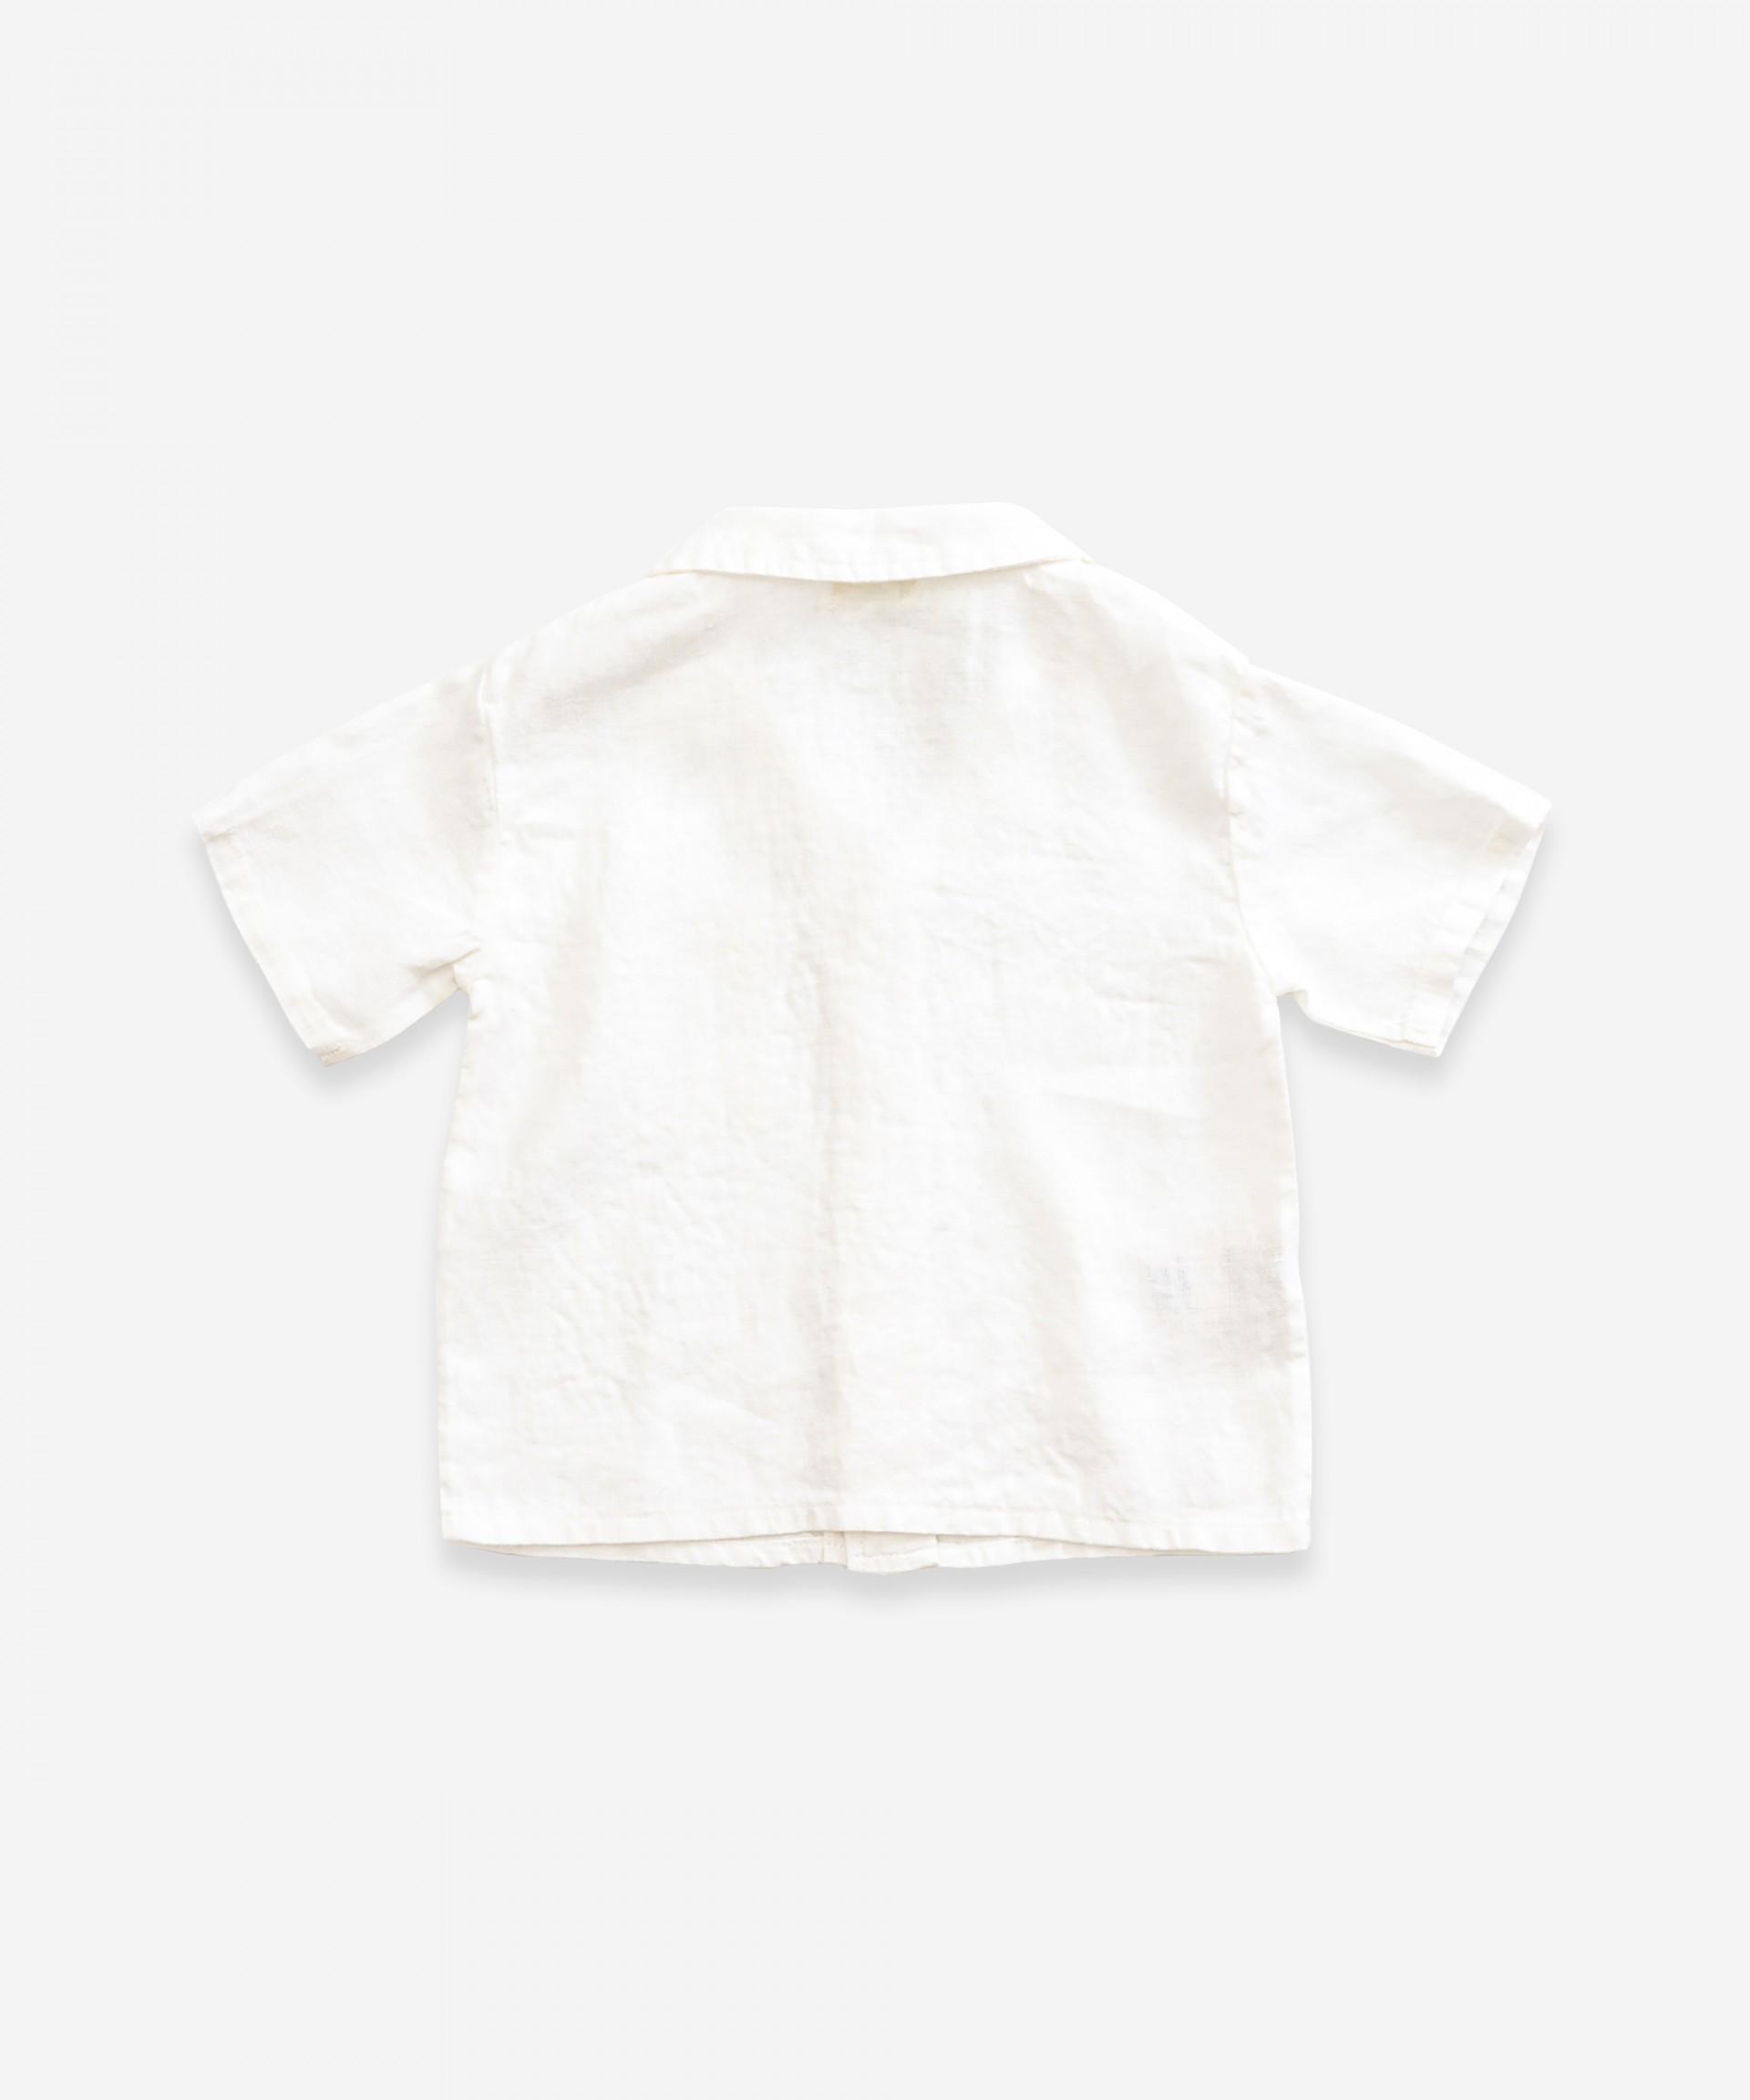 Camisa de lino con bolsillo | Weaving